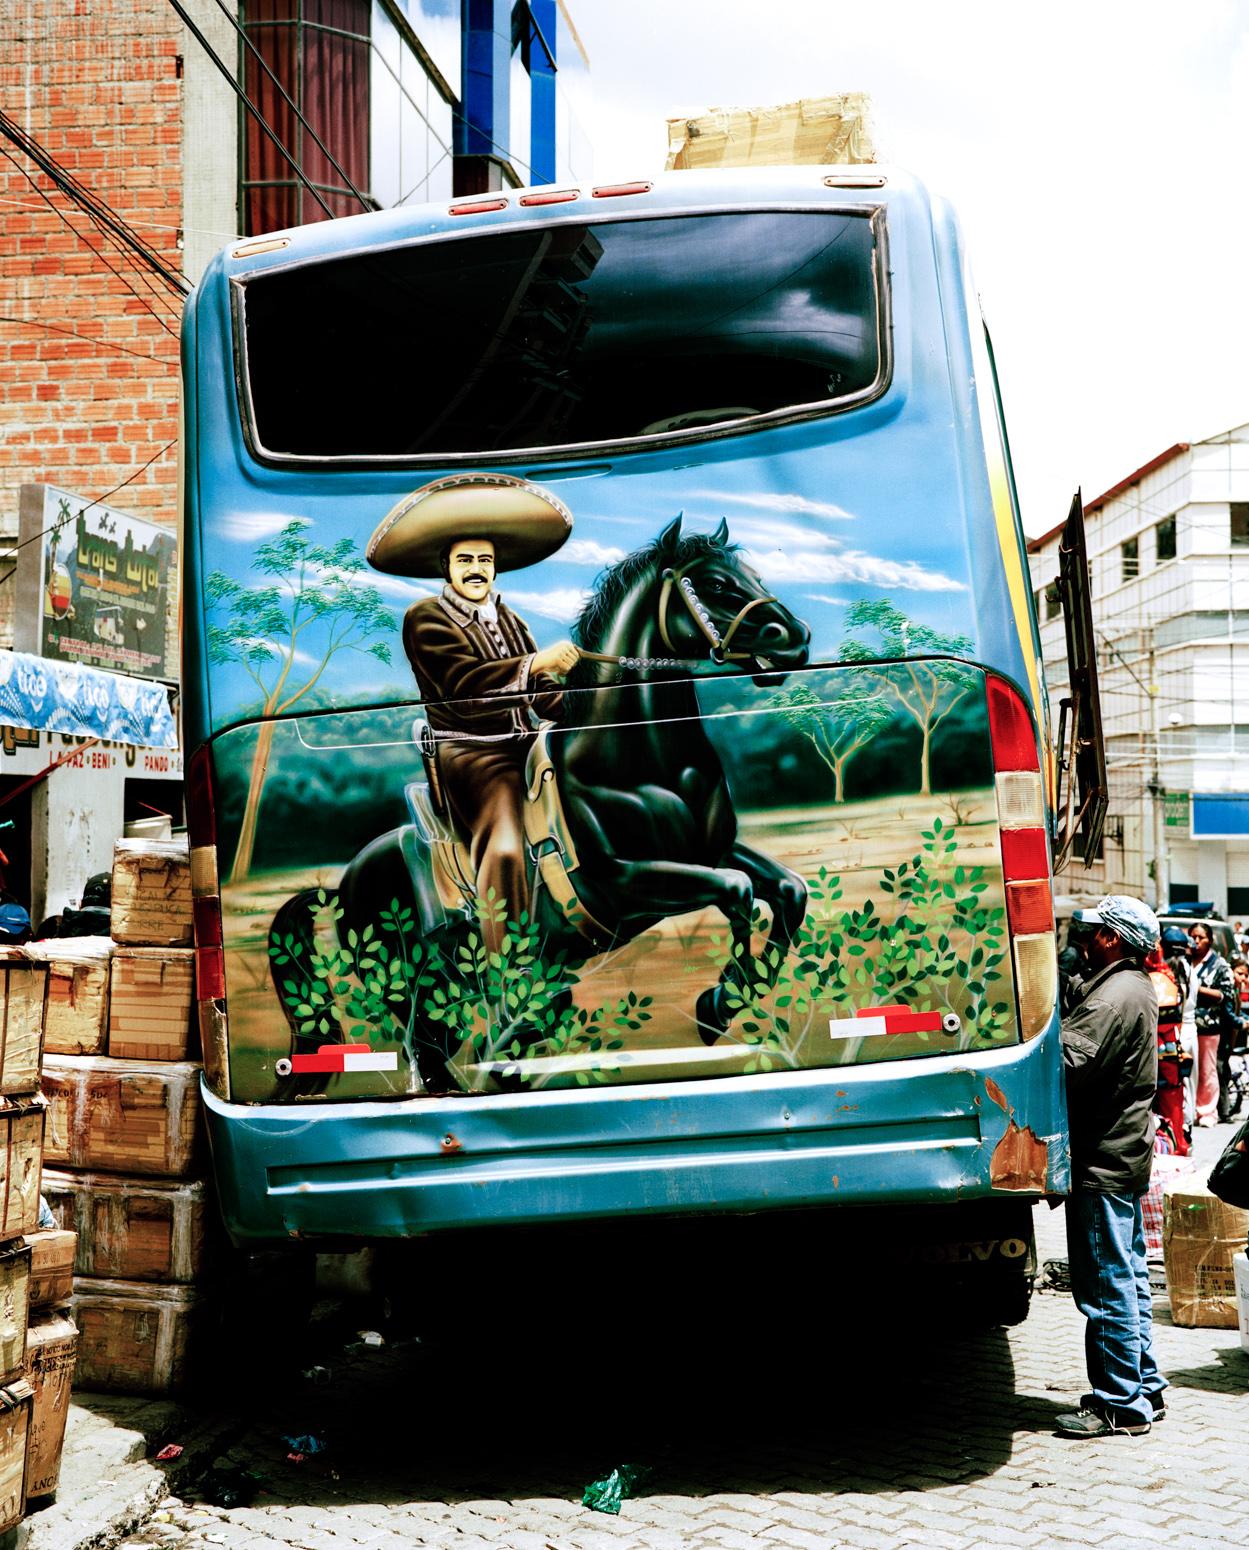 Daniel_Hofer_Bolivian_Busses_195_01_1550PX_WEB.jpg